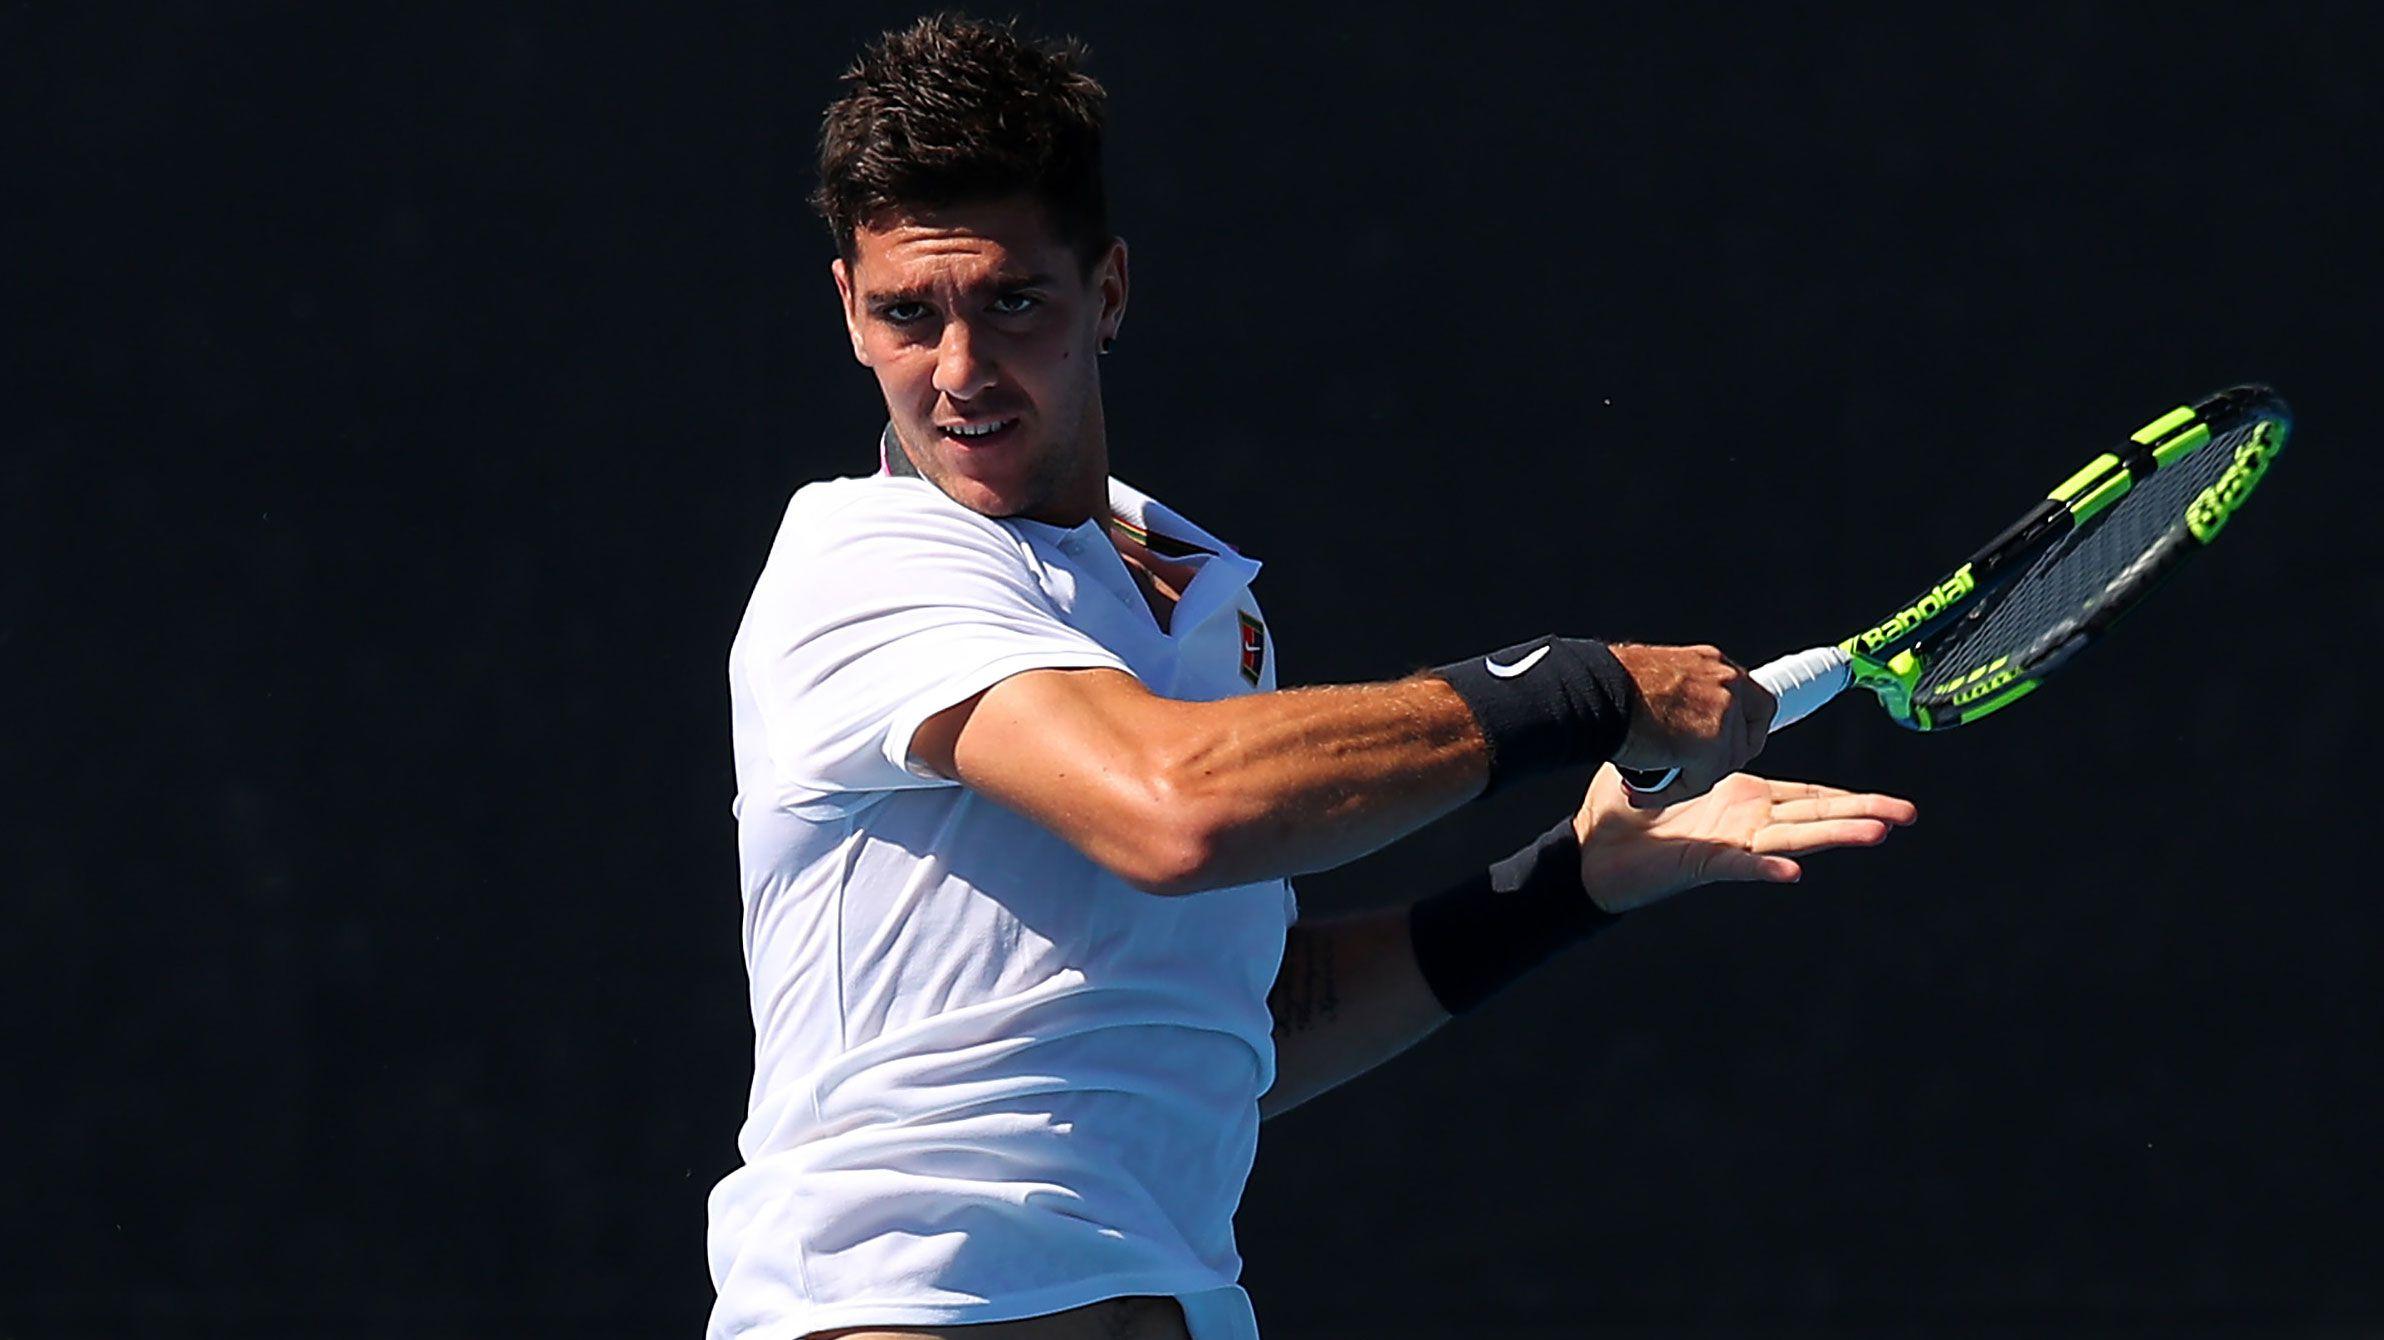 Thanasi Kokkinakis refutes feud with Lleyton Hewitt after qualifying for Australian Open